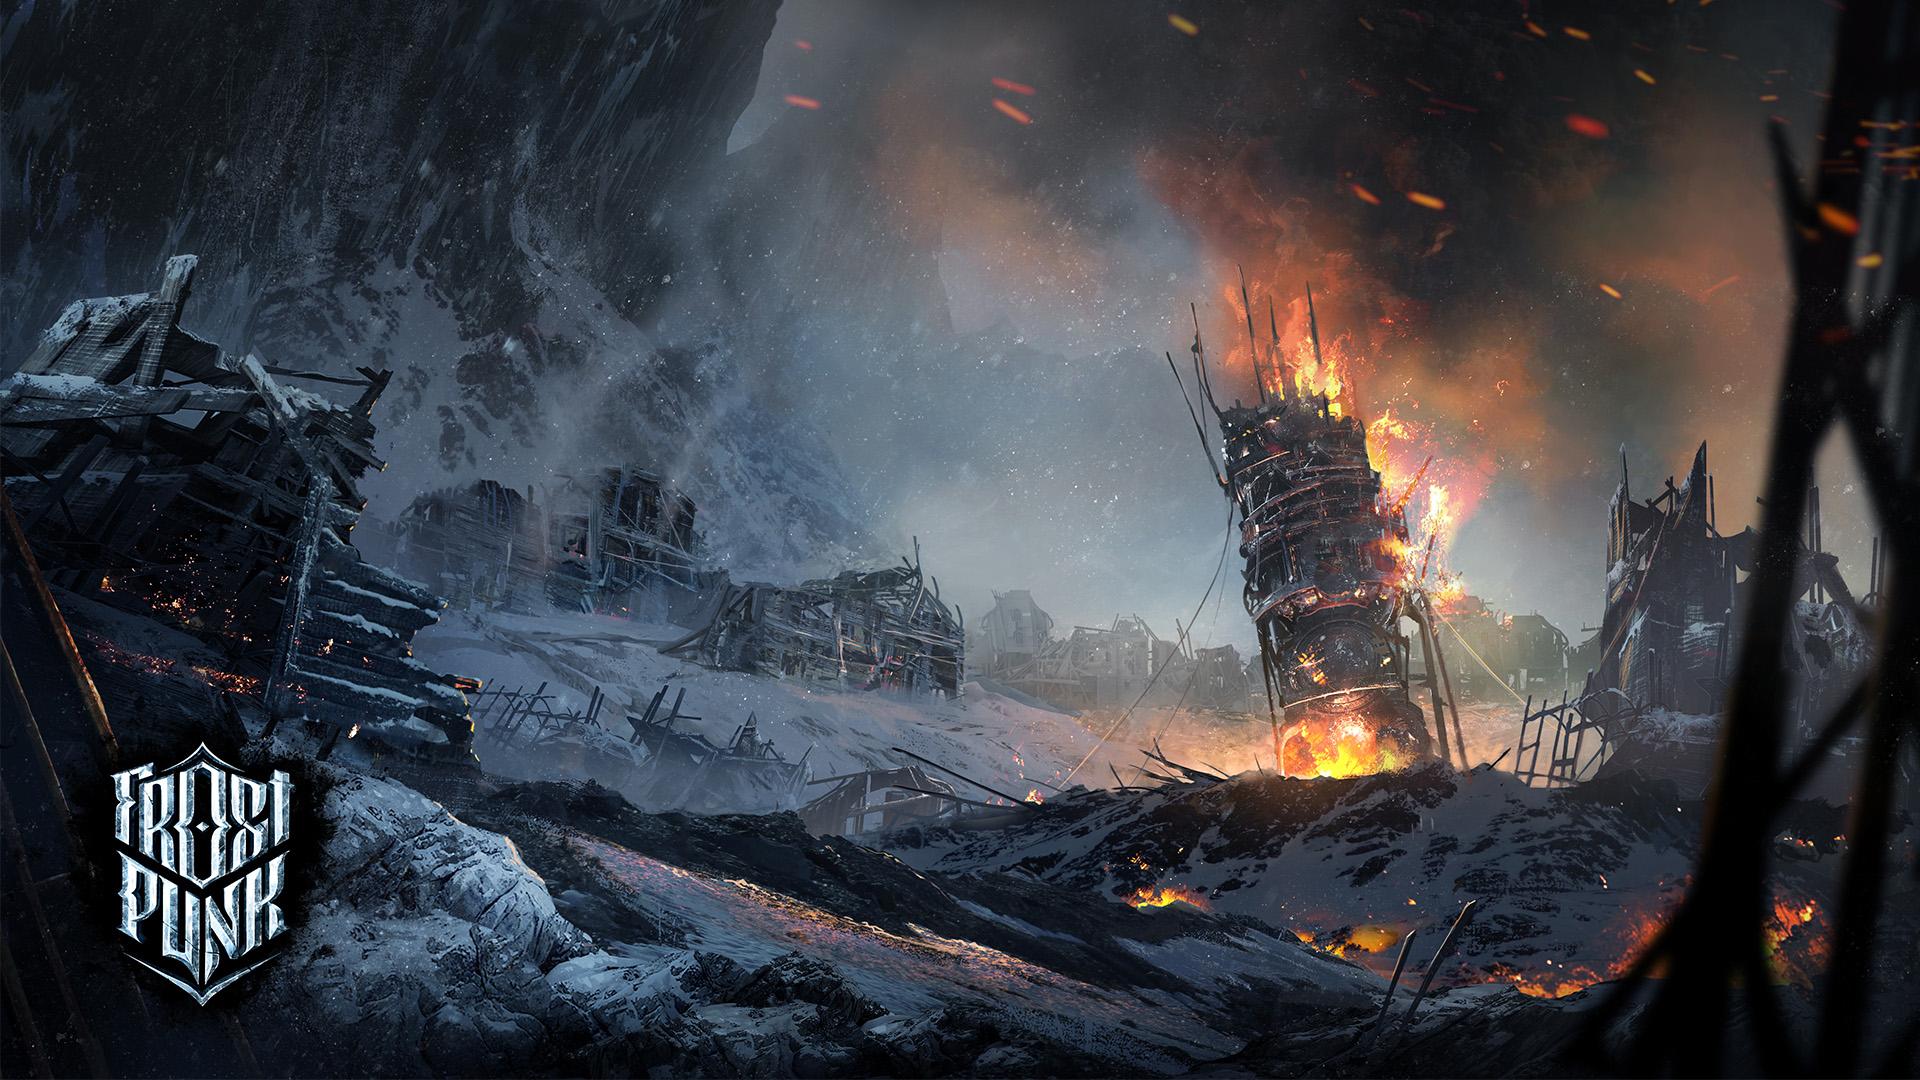 La expansión Frostpunk: The Fall of Winterhome sale esta semana